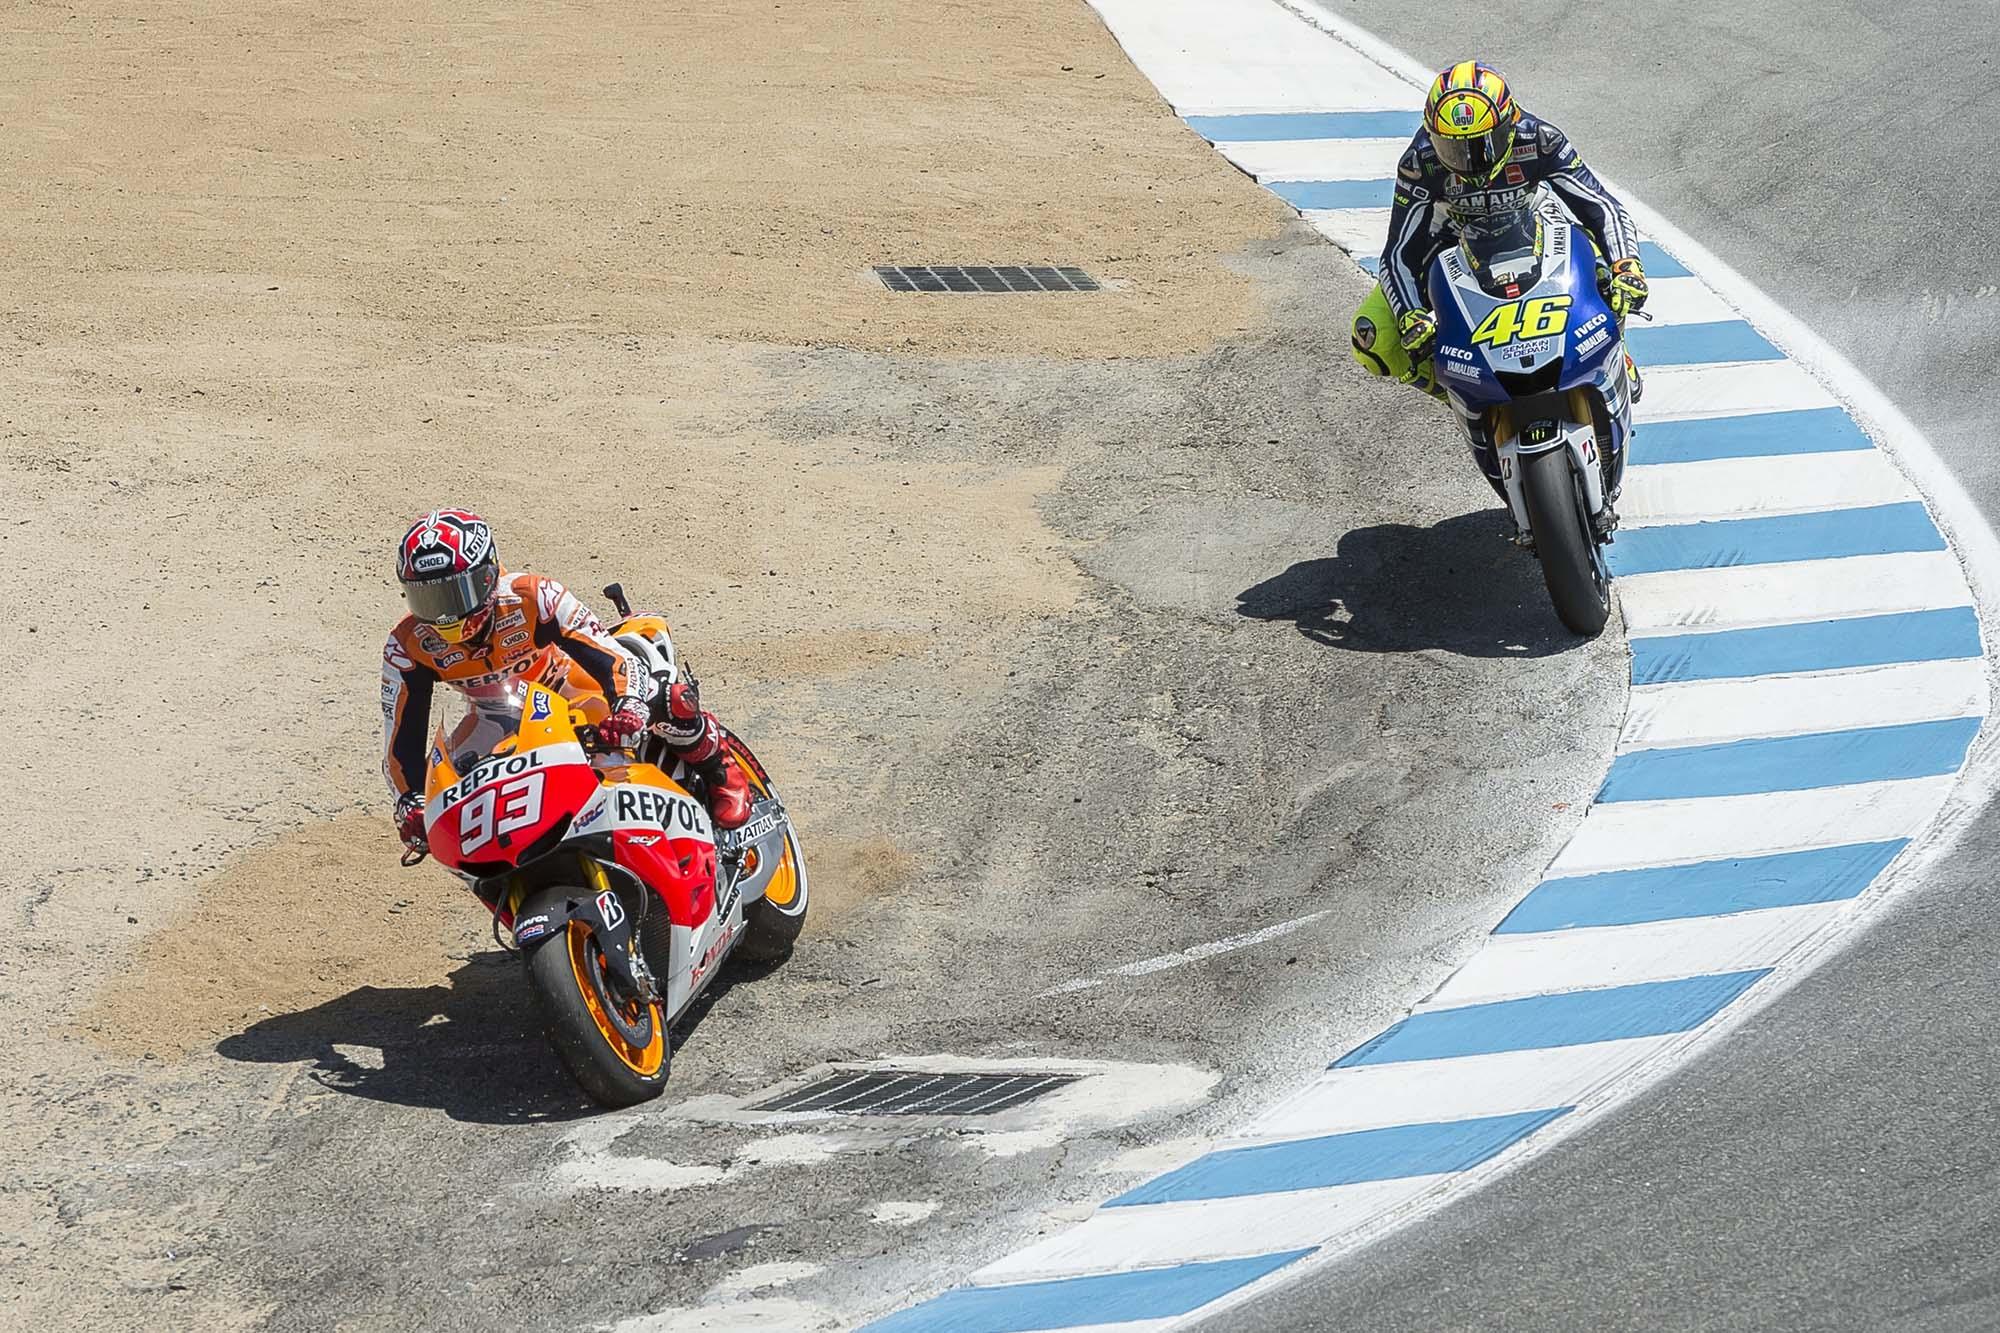 GP Laguna Seca - Page 3 Marc-Marquez-Valentino-Rossi-Laguna-Seca-Corkscrew-Pass-Kevin-Warren-5